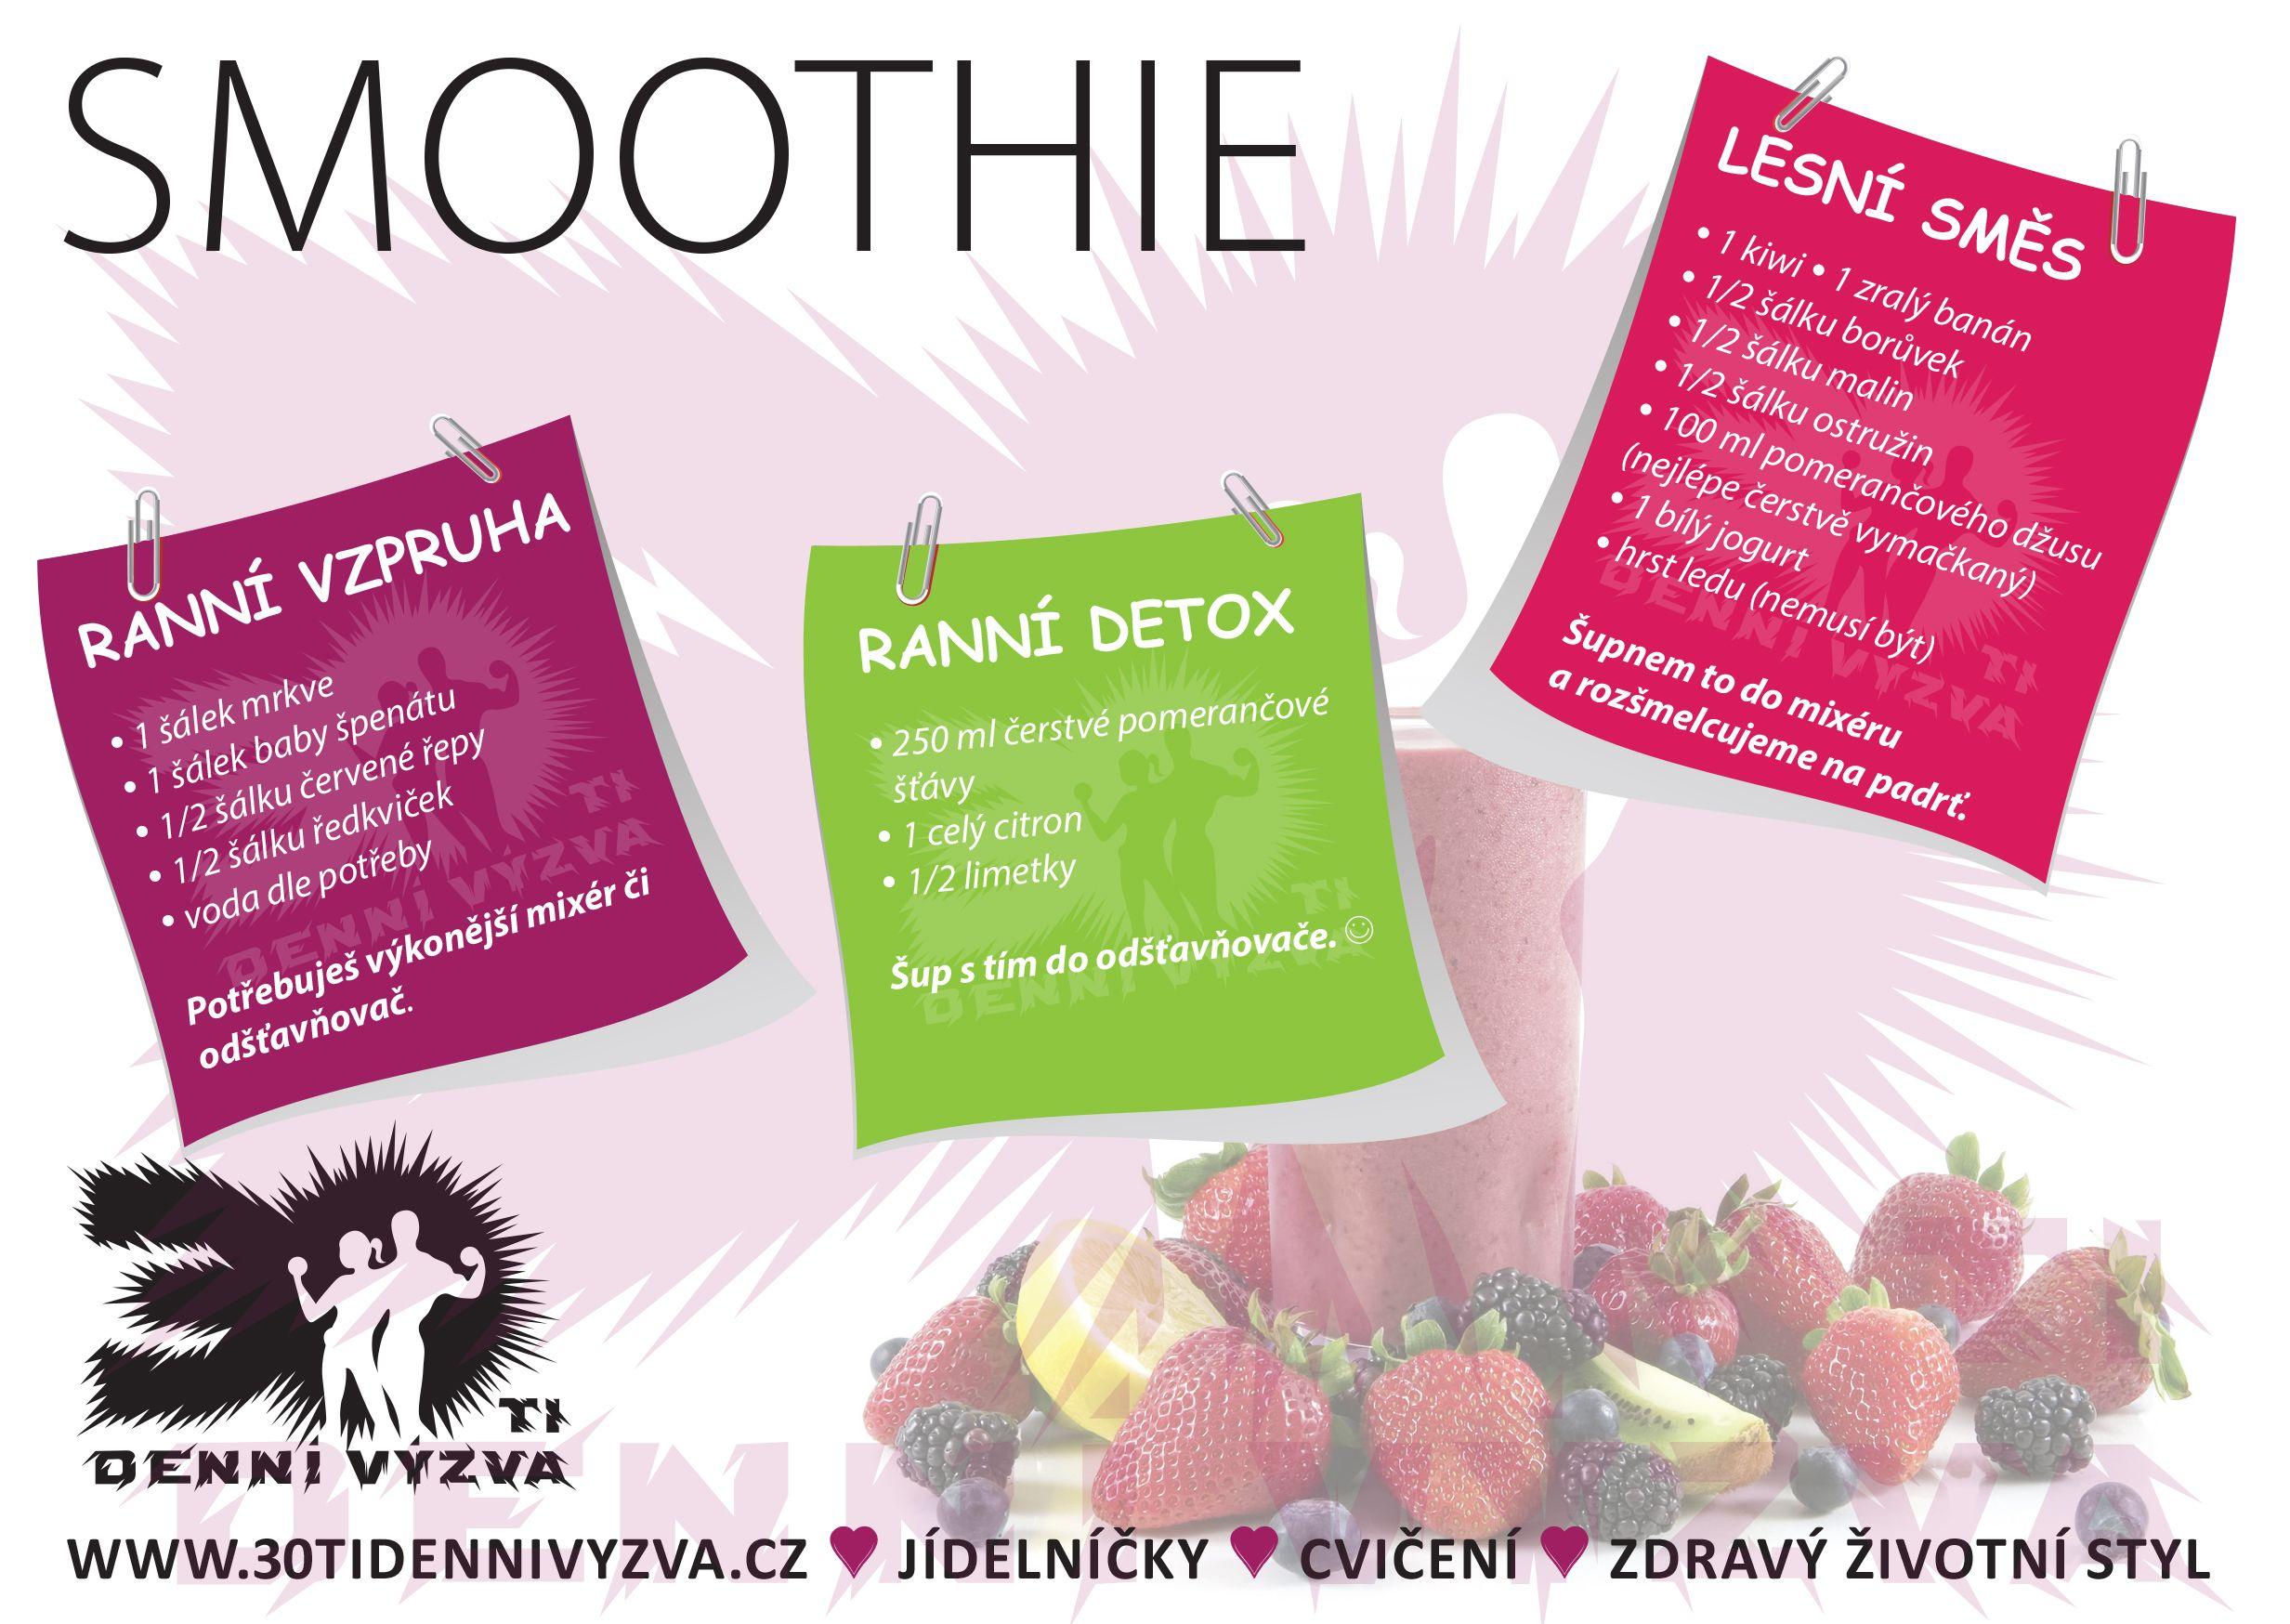 Smoothie - 2. díl - 30ti denní výzva